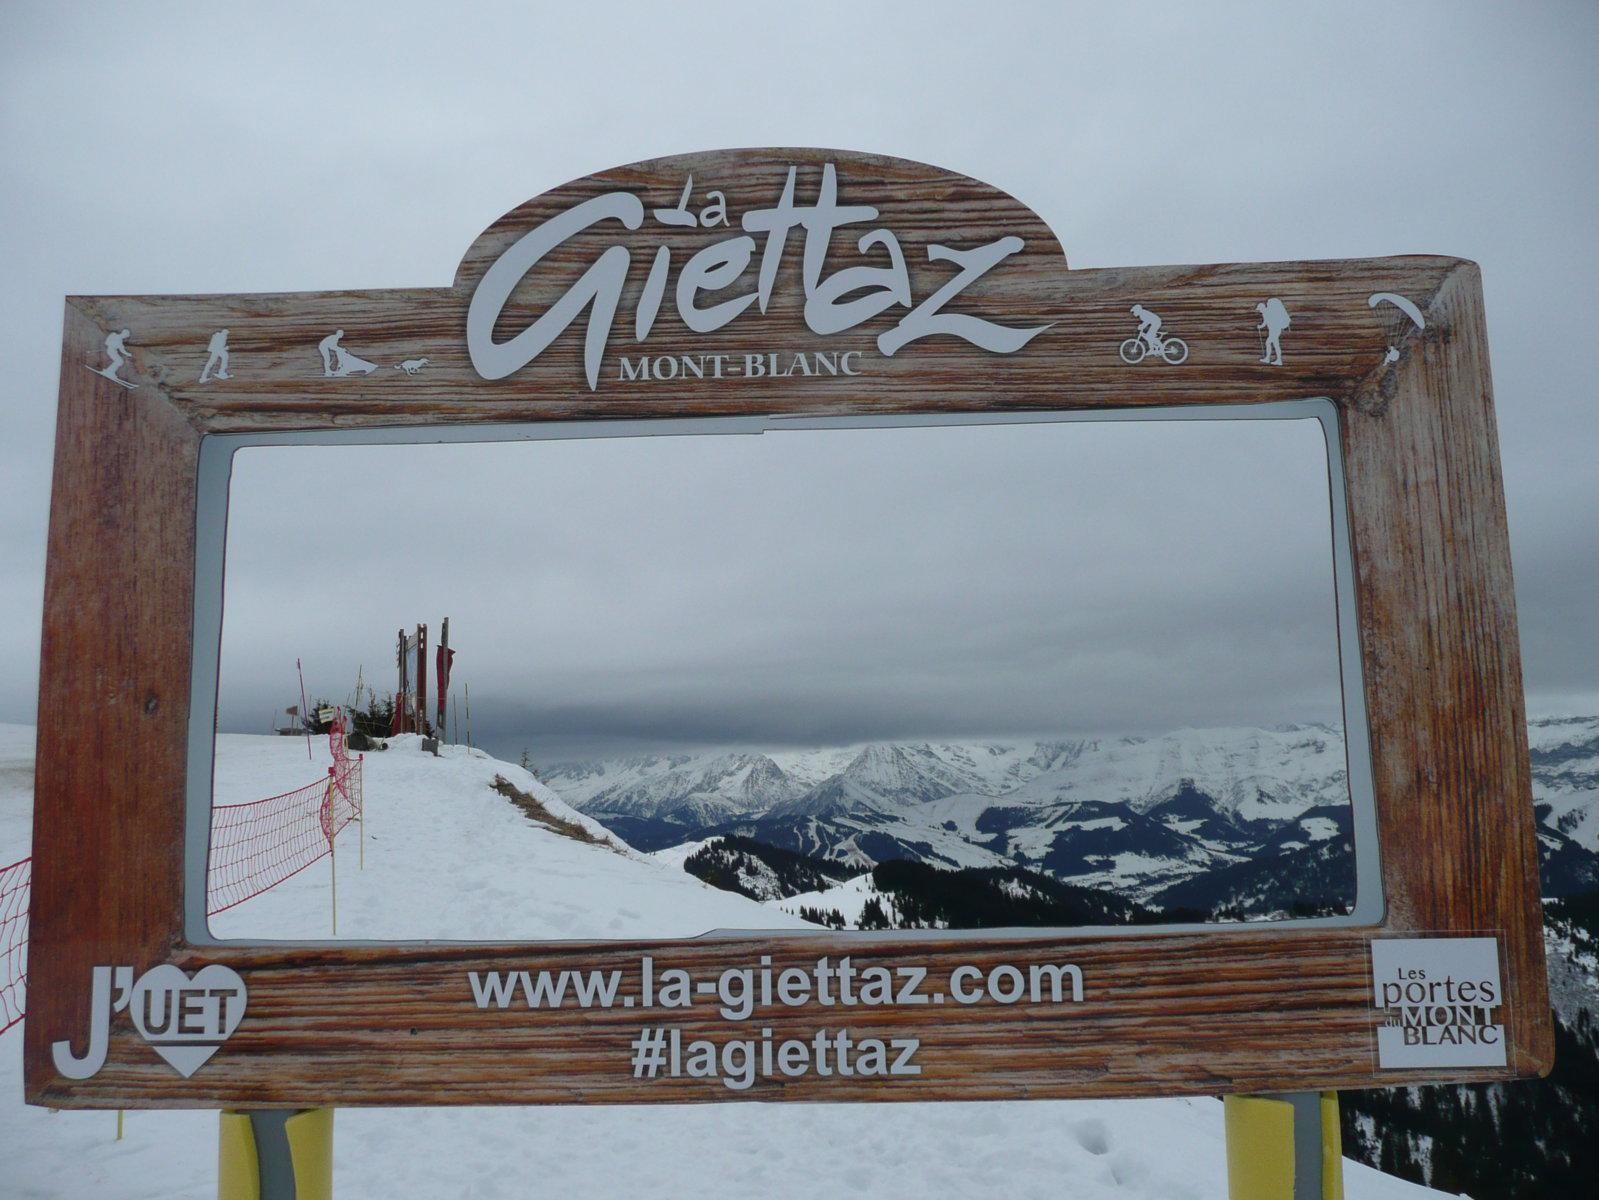 ma il Mont Blanc dov'è?